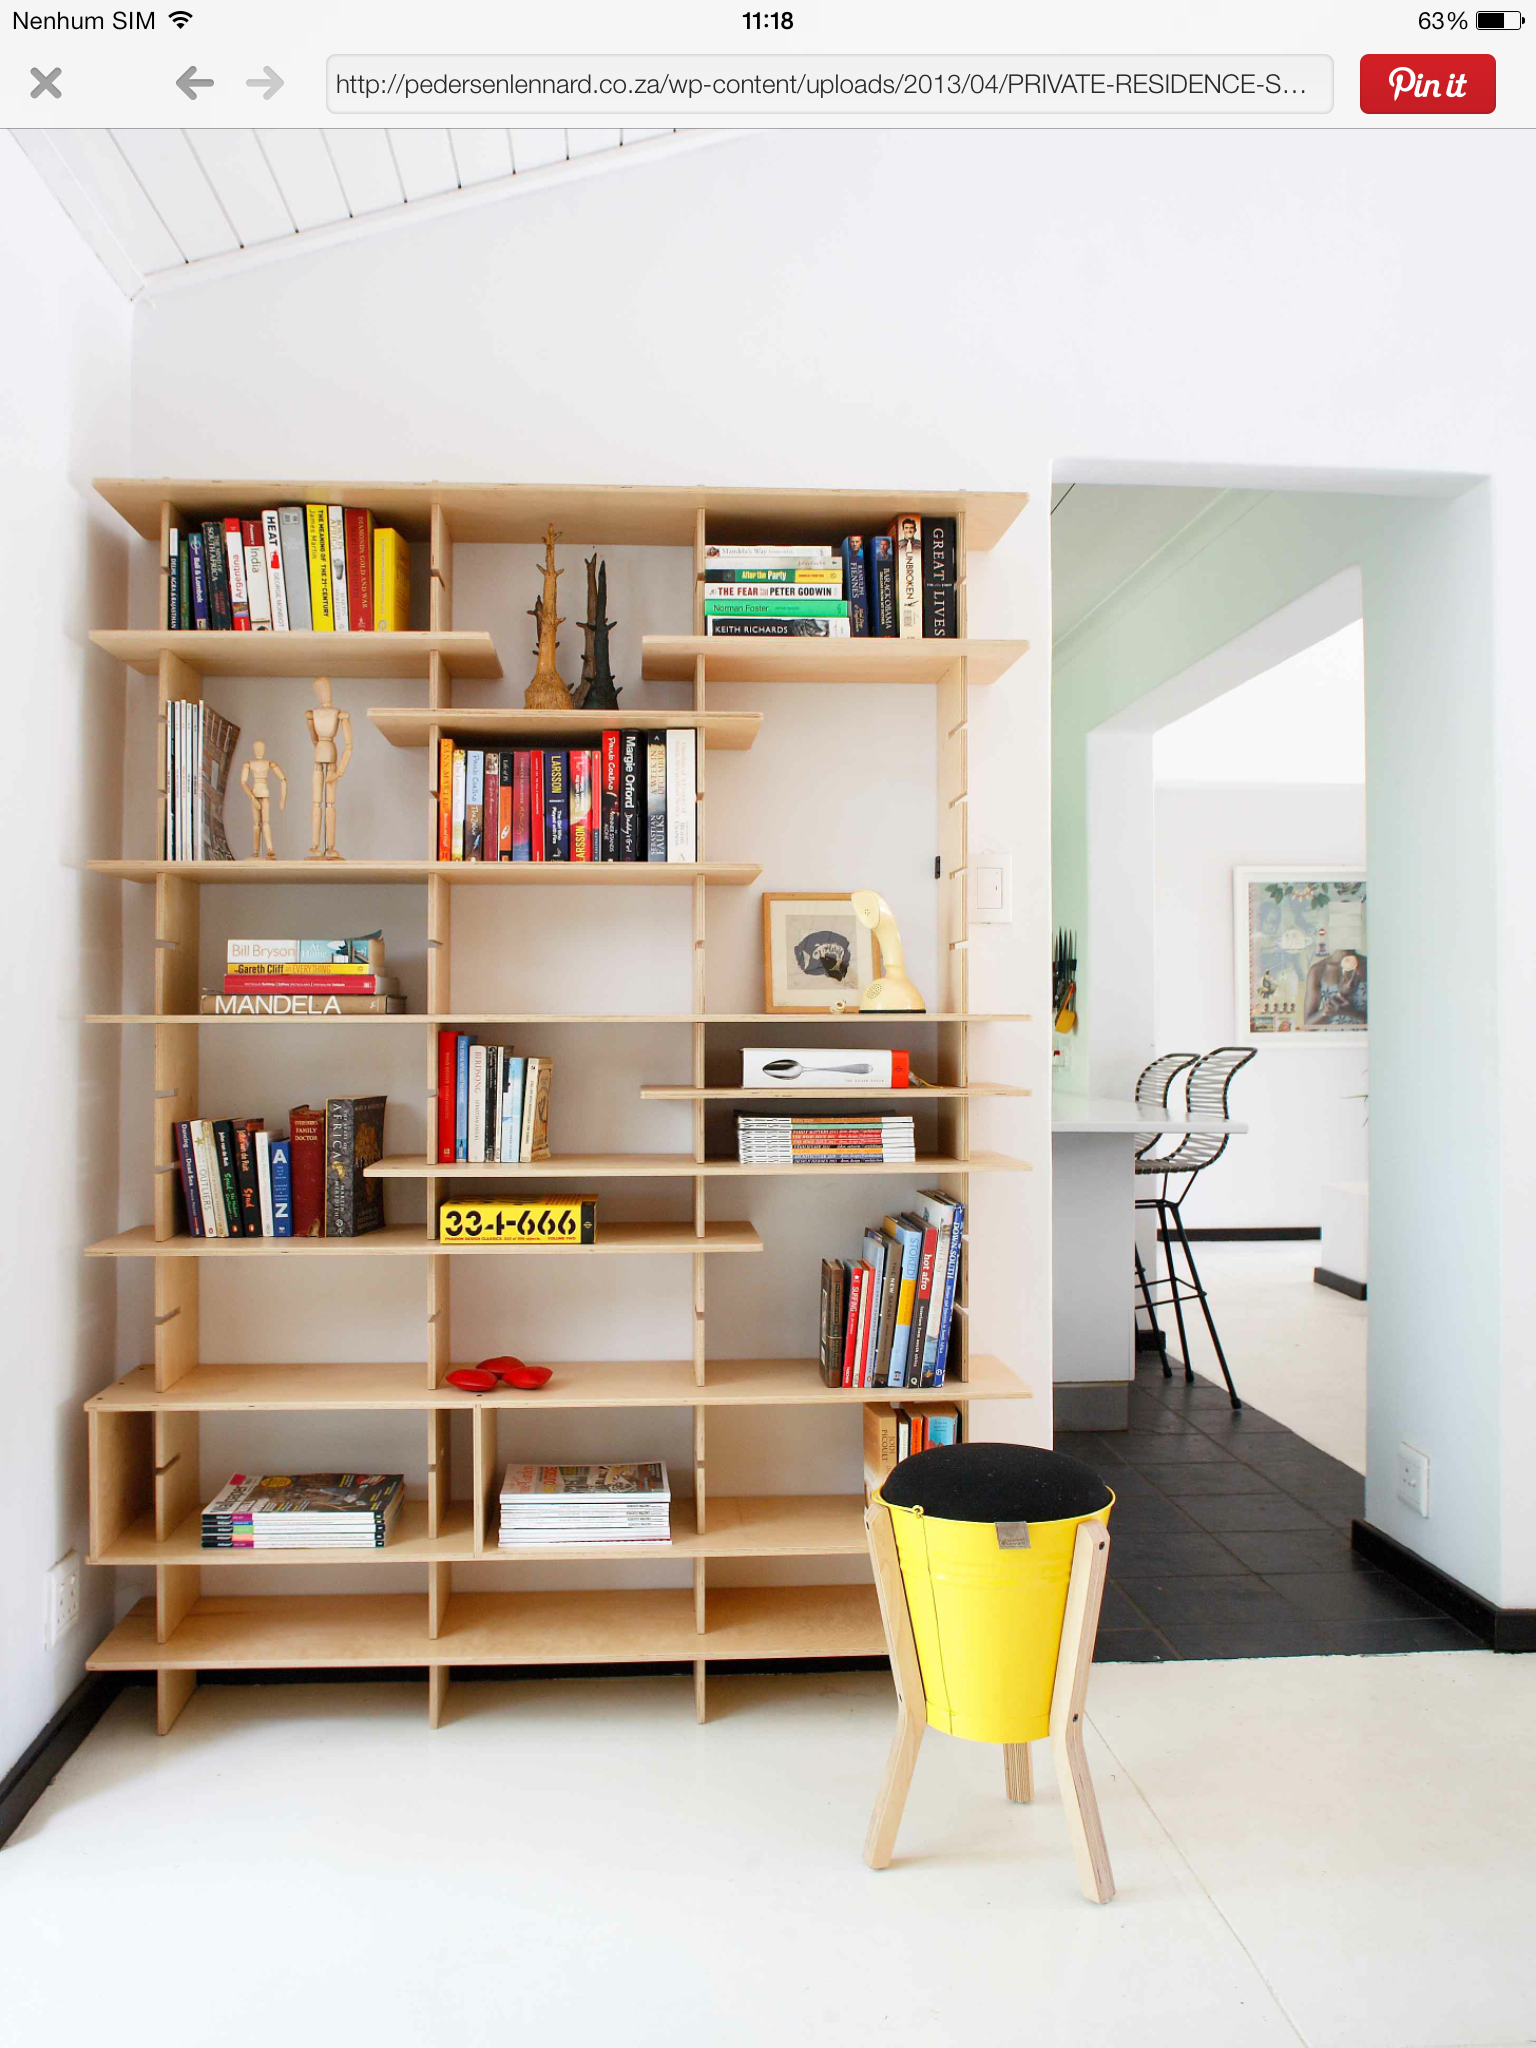 Pin By Jordan Roeder On Apto Itu Adjustable Bookshelf Plywood Shelves Interior